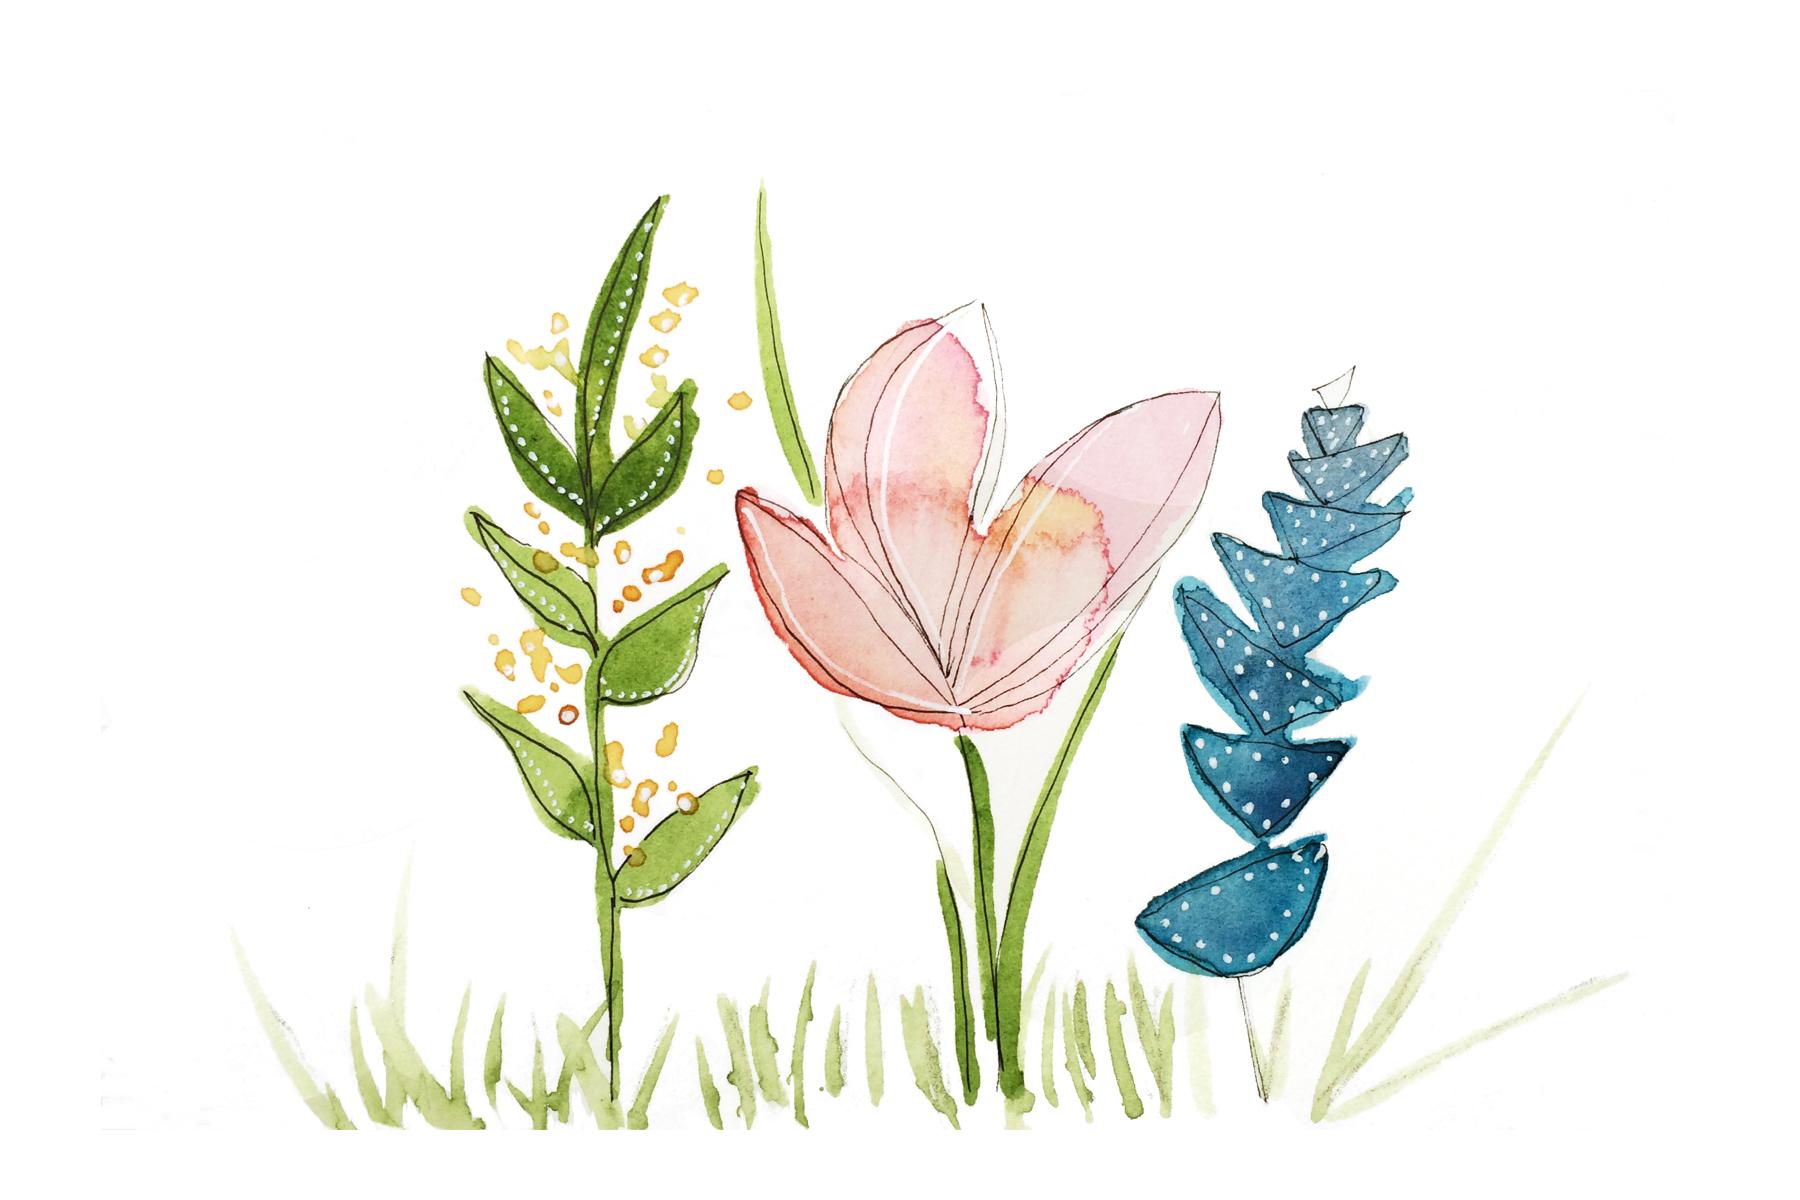 Flowers, Watercolor, 2015